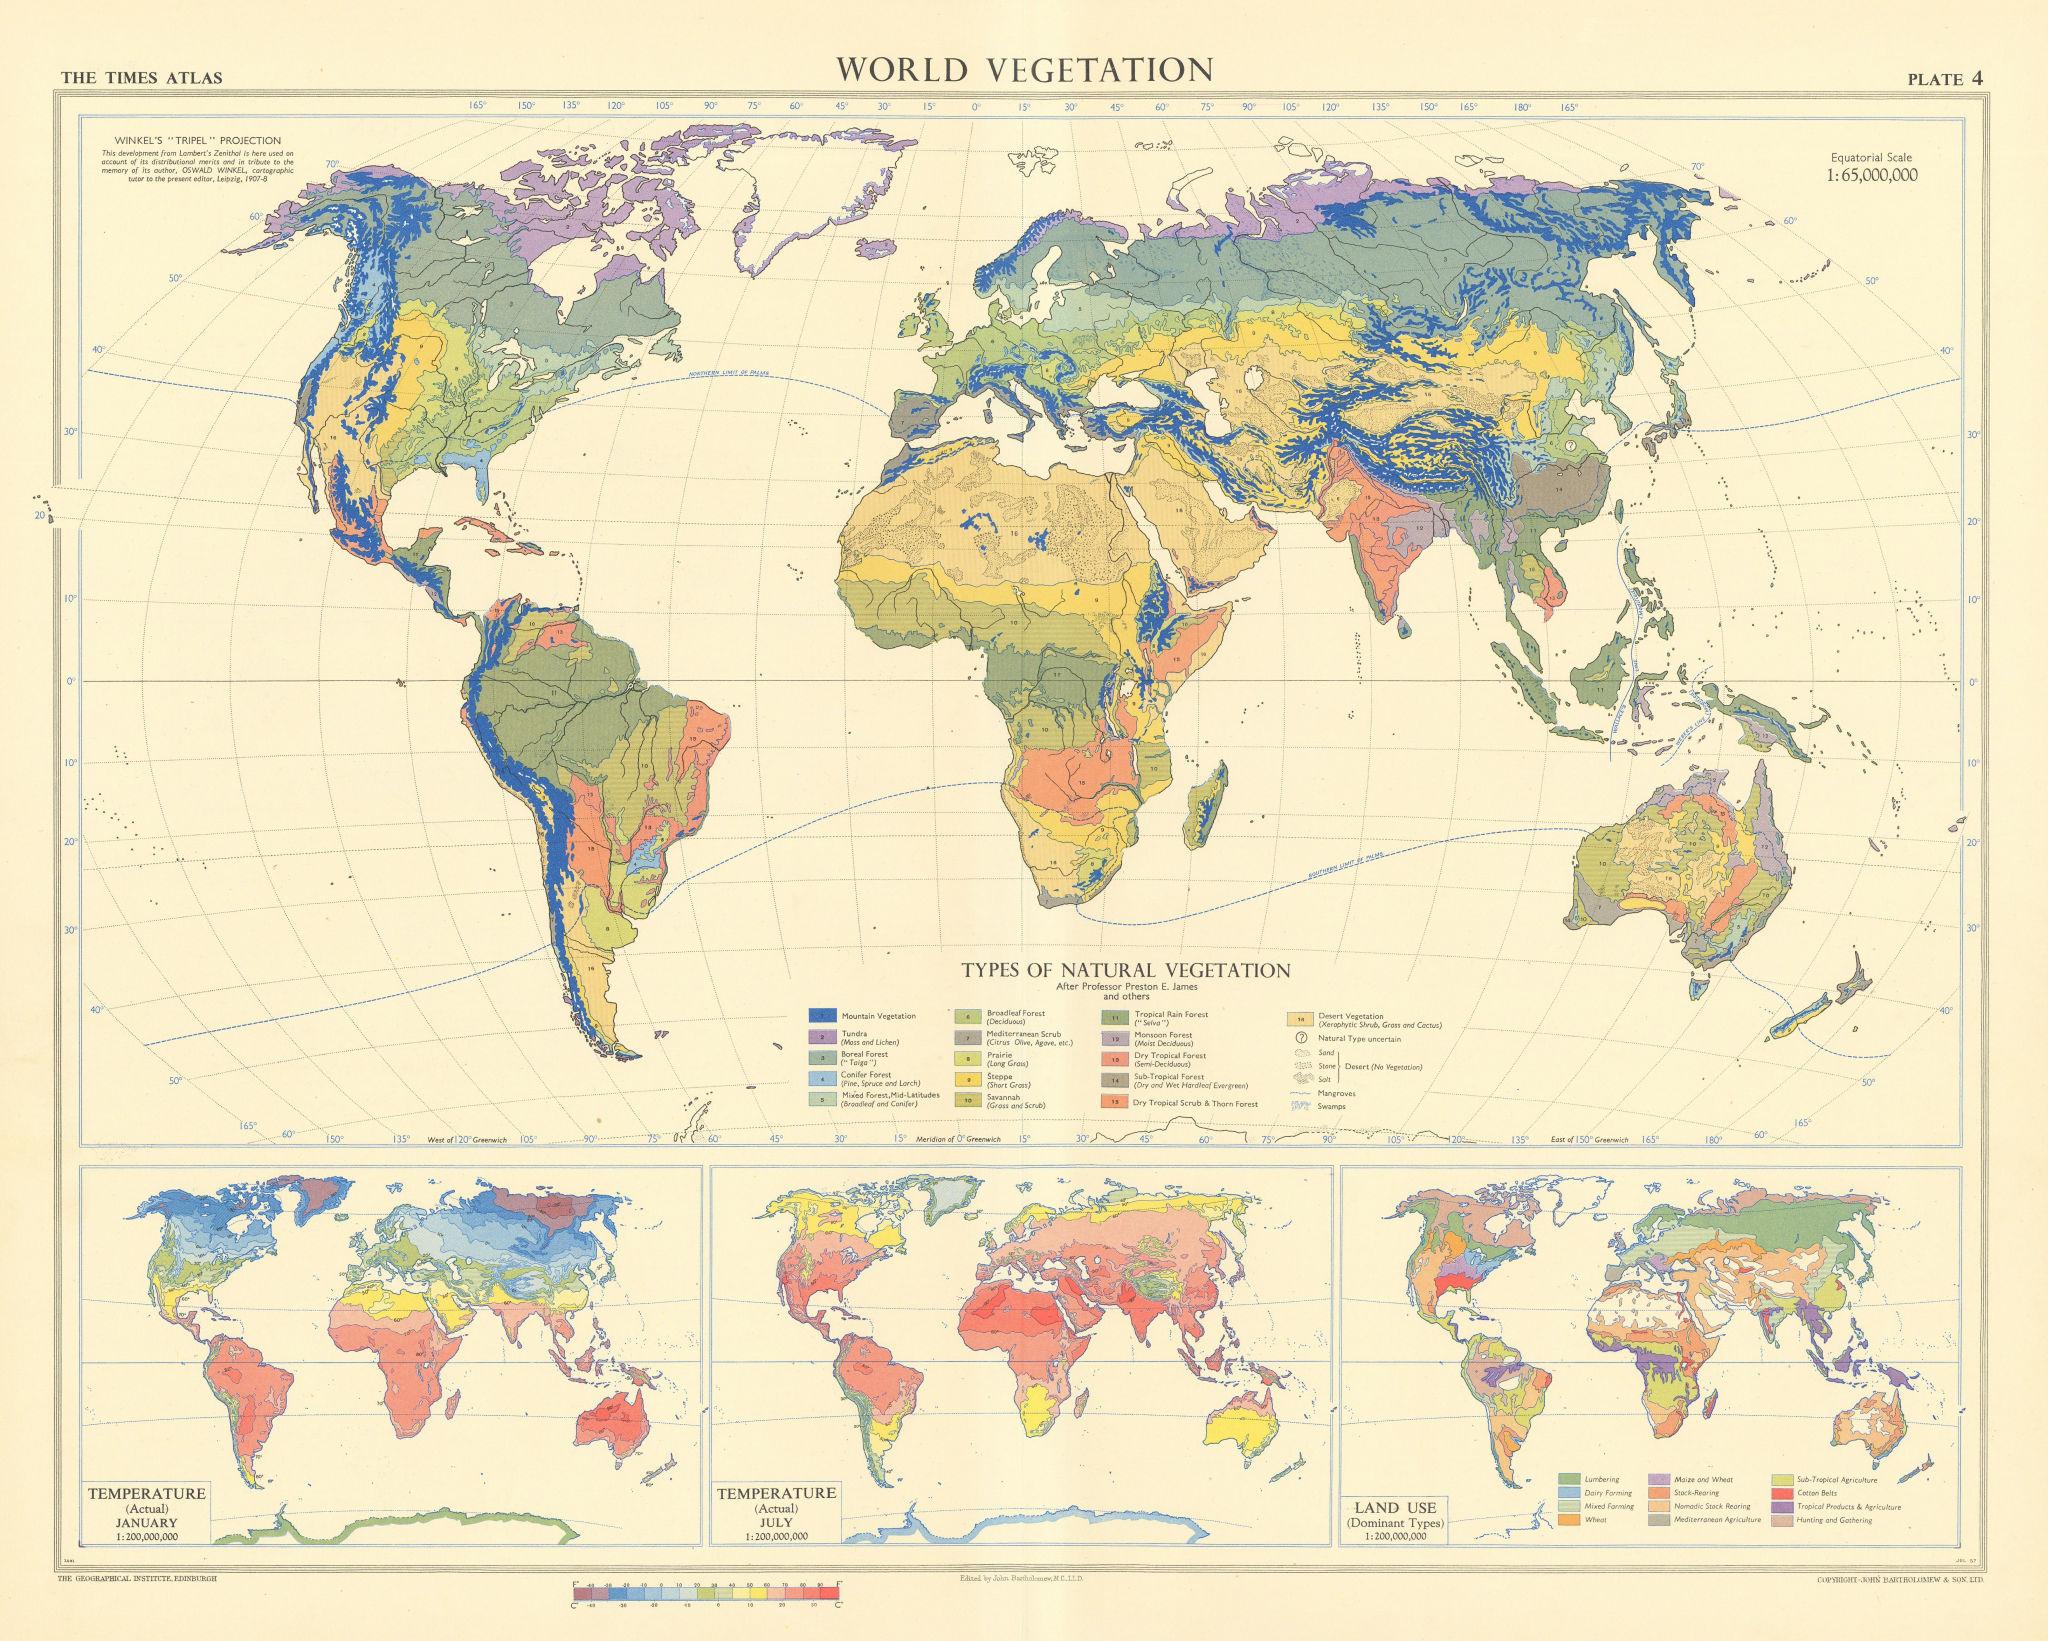 World Vegetation. Temperature & Land use. TIMES 1958 old vintage map chart